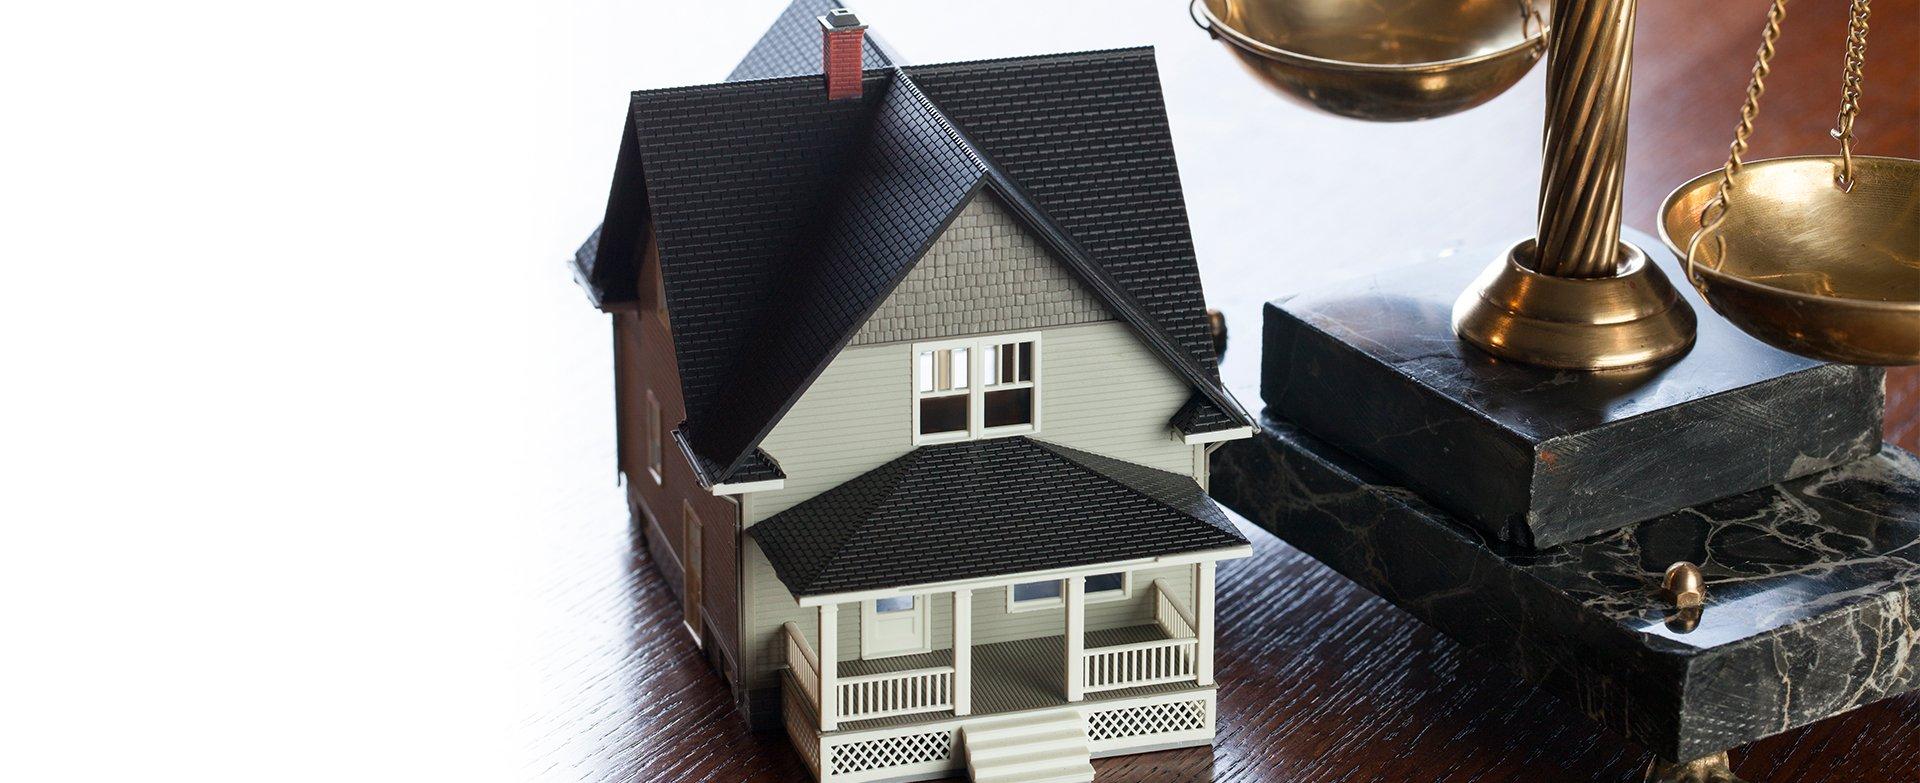 model property